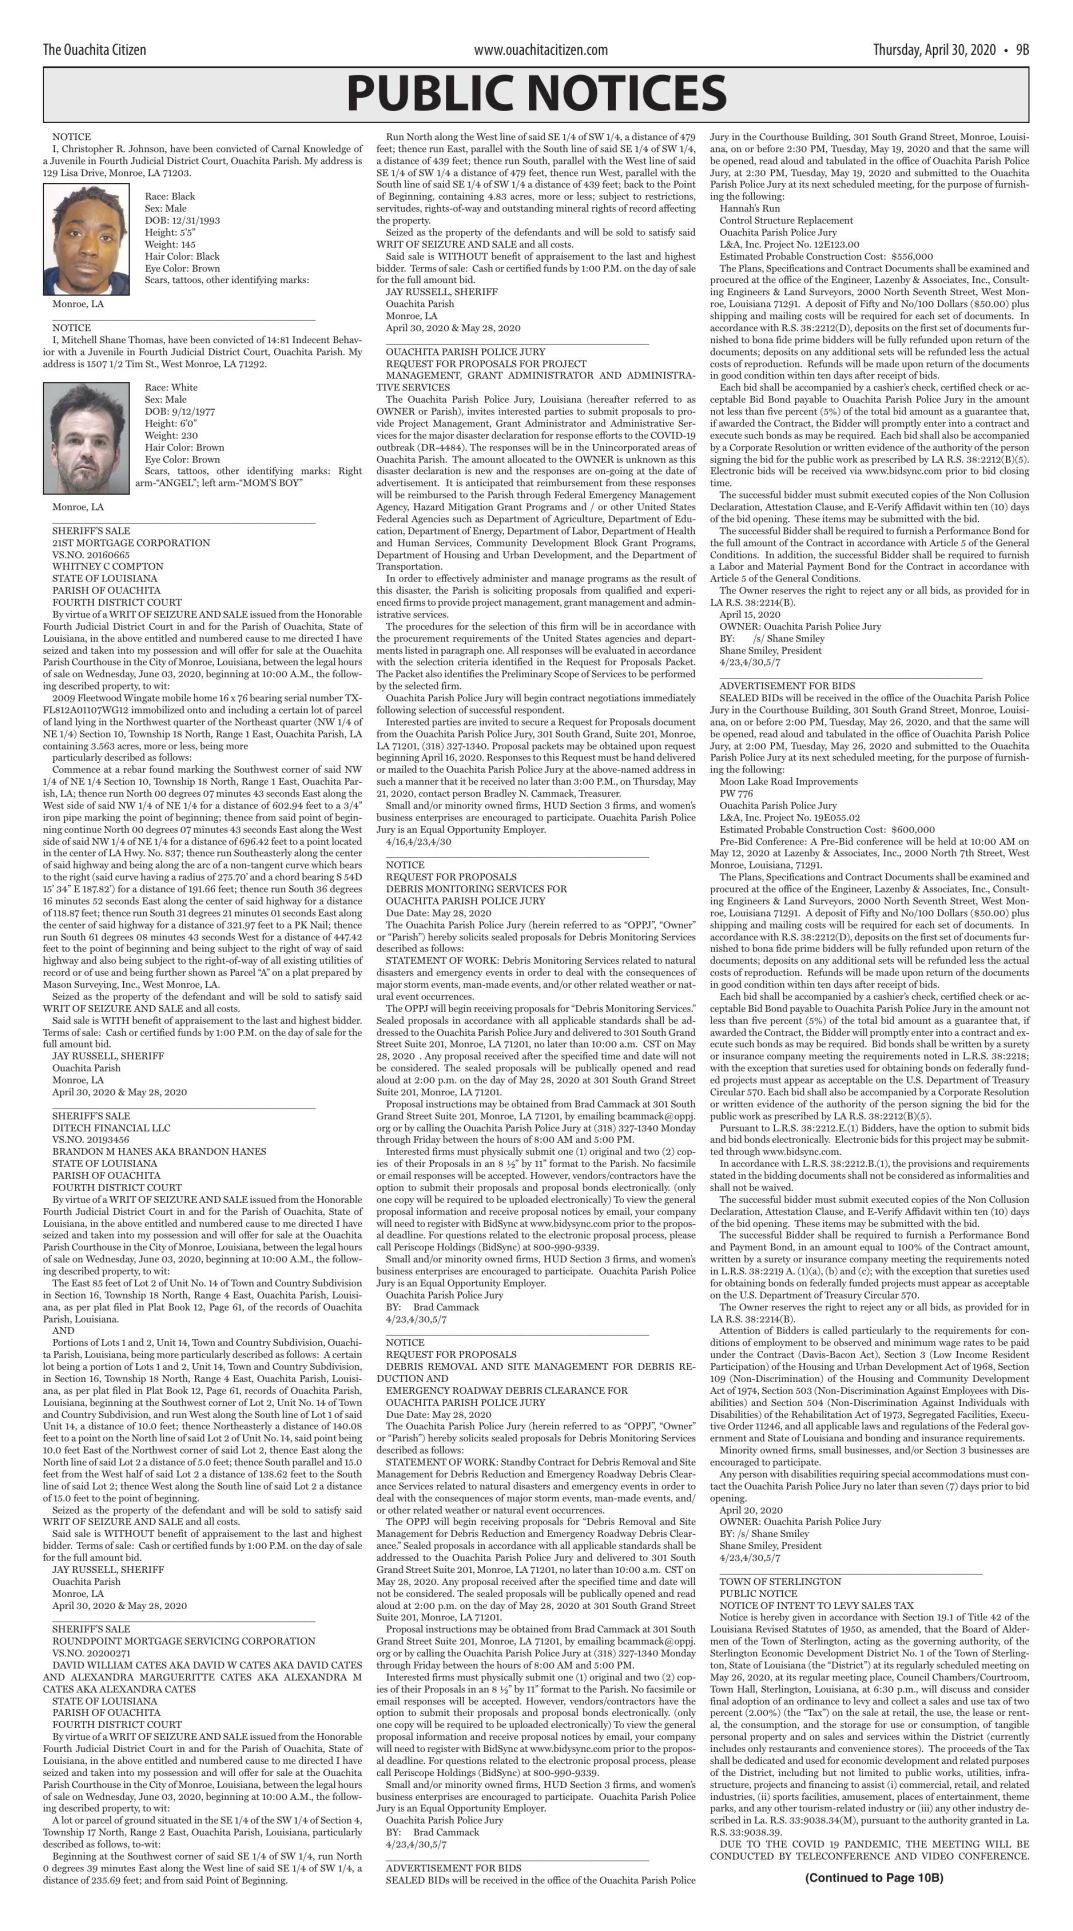 April 30, 2020 Public Notices, click to download pages